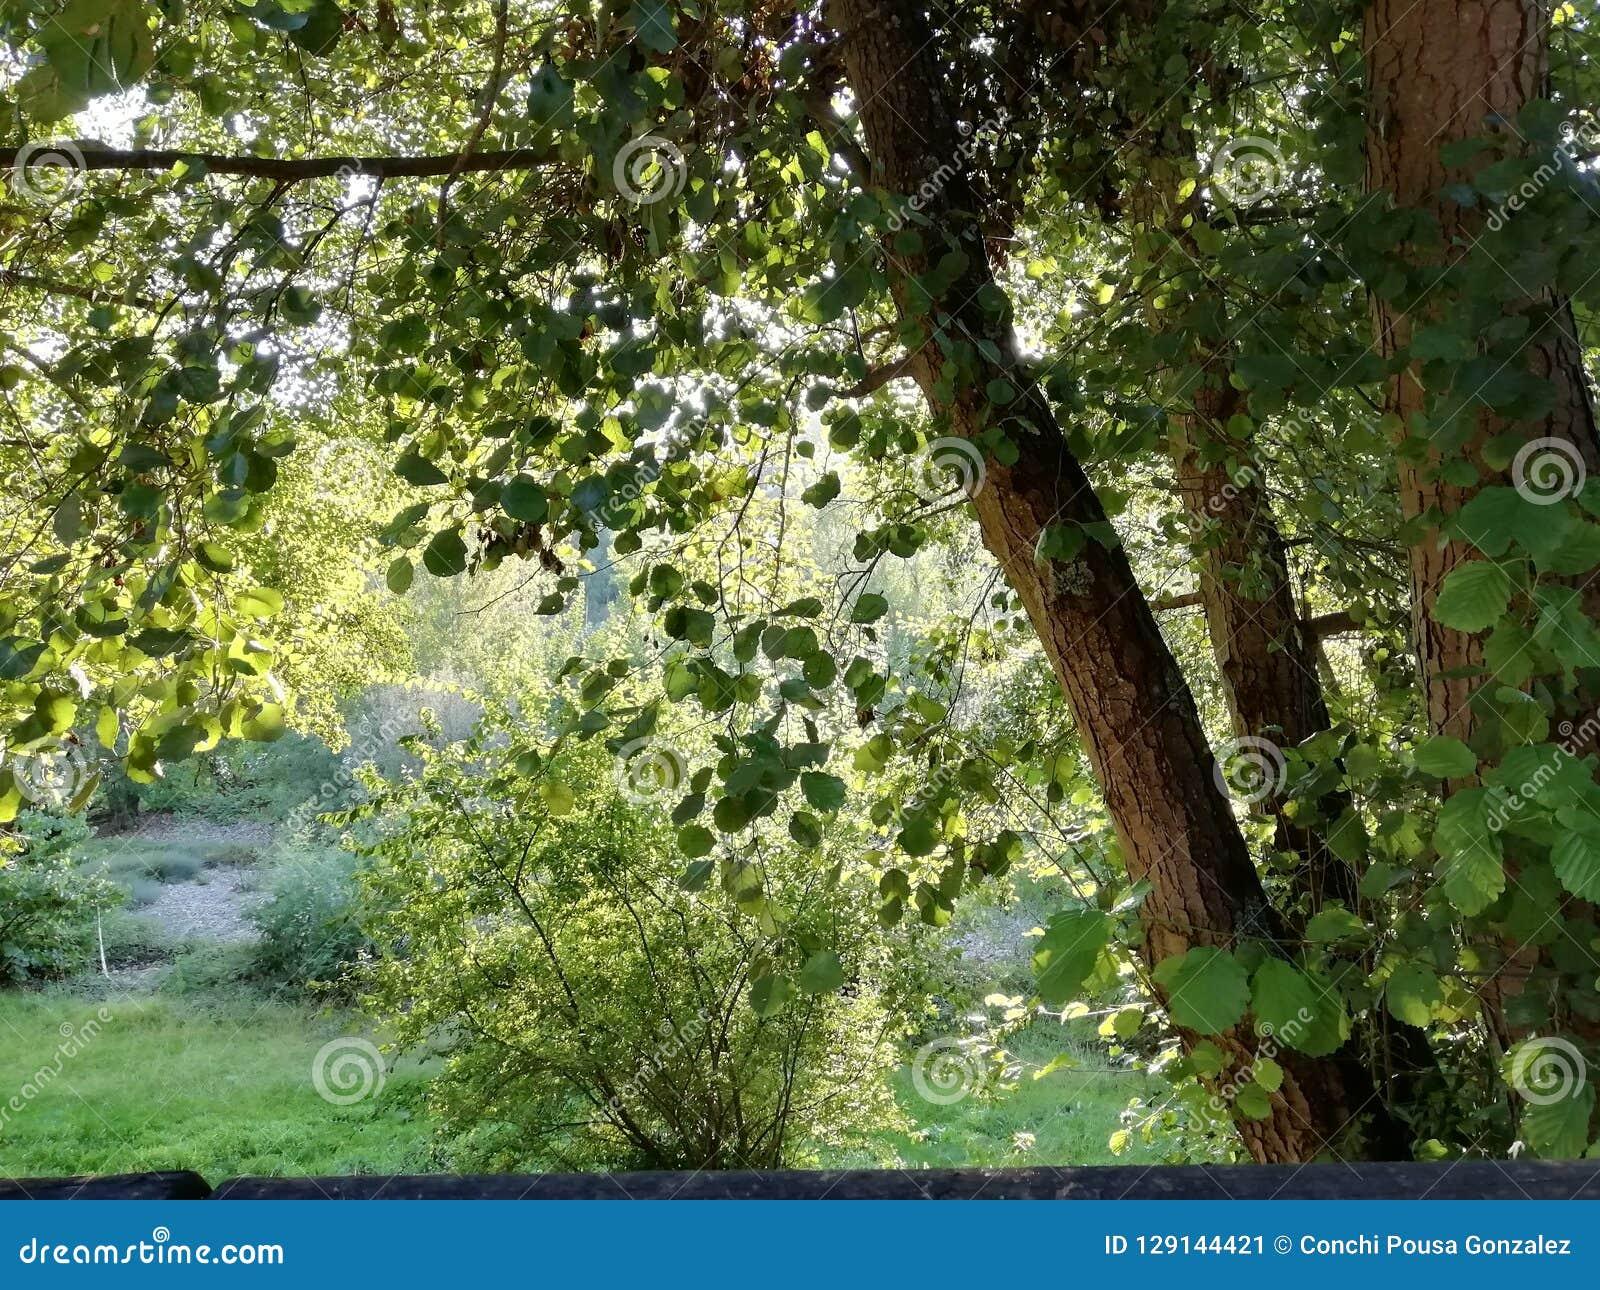 Grove near the river